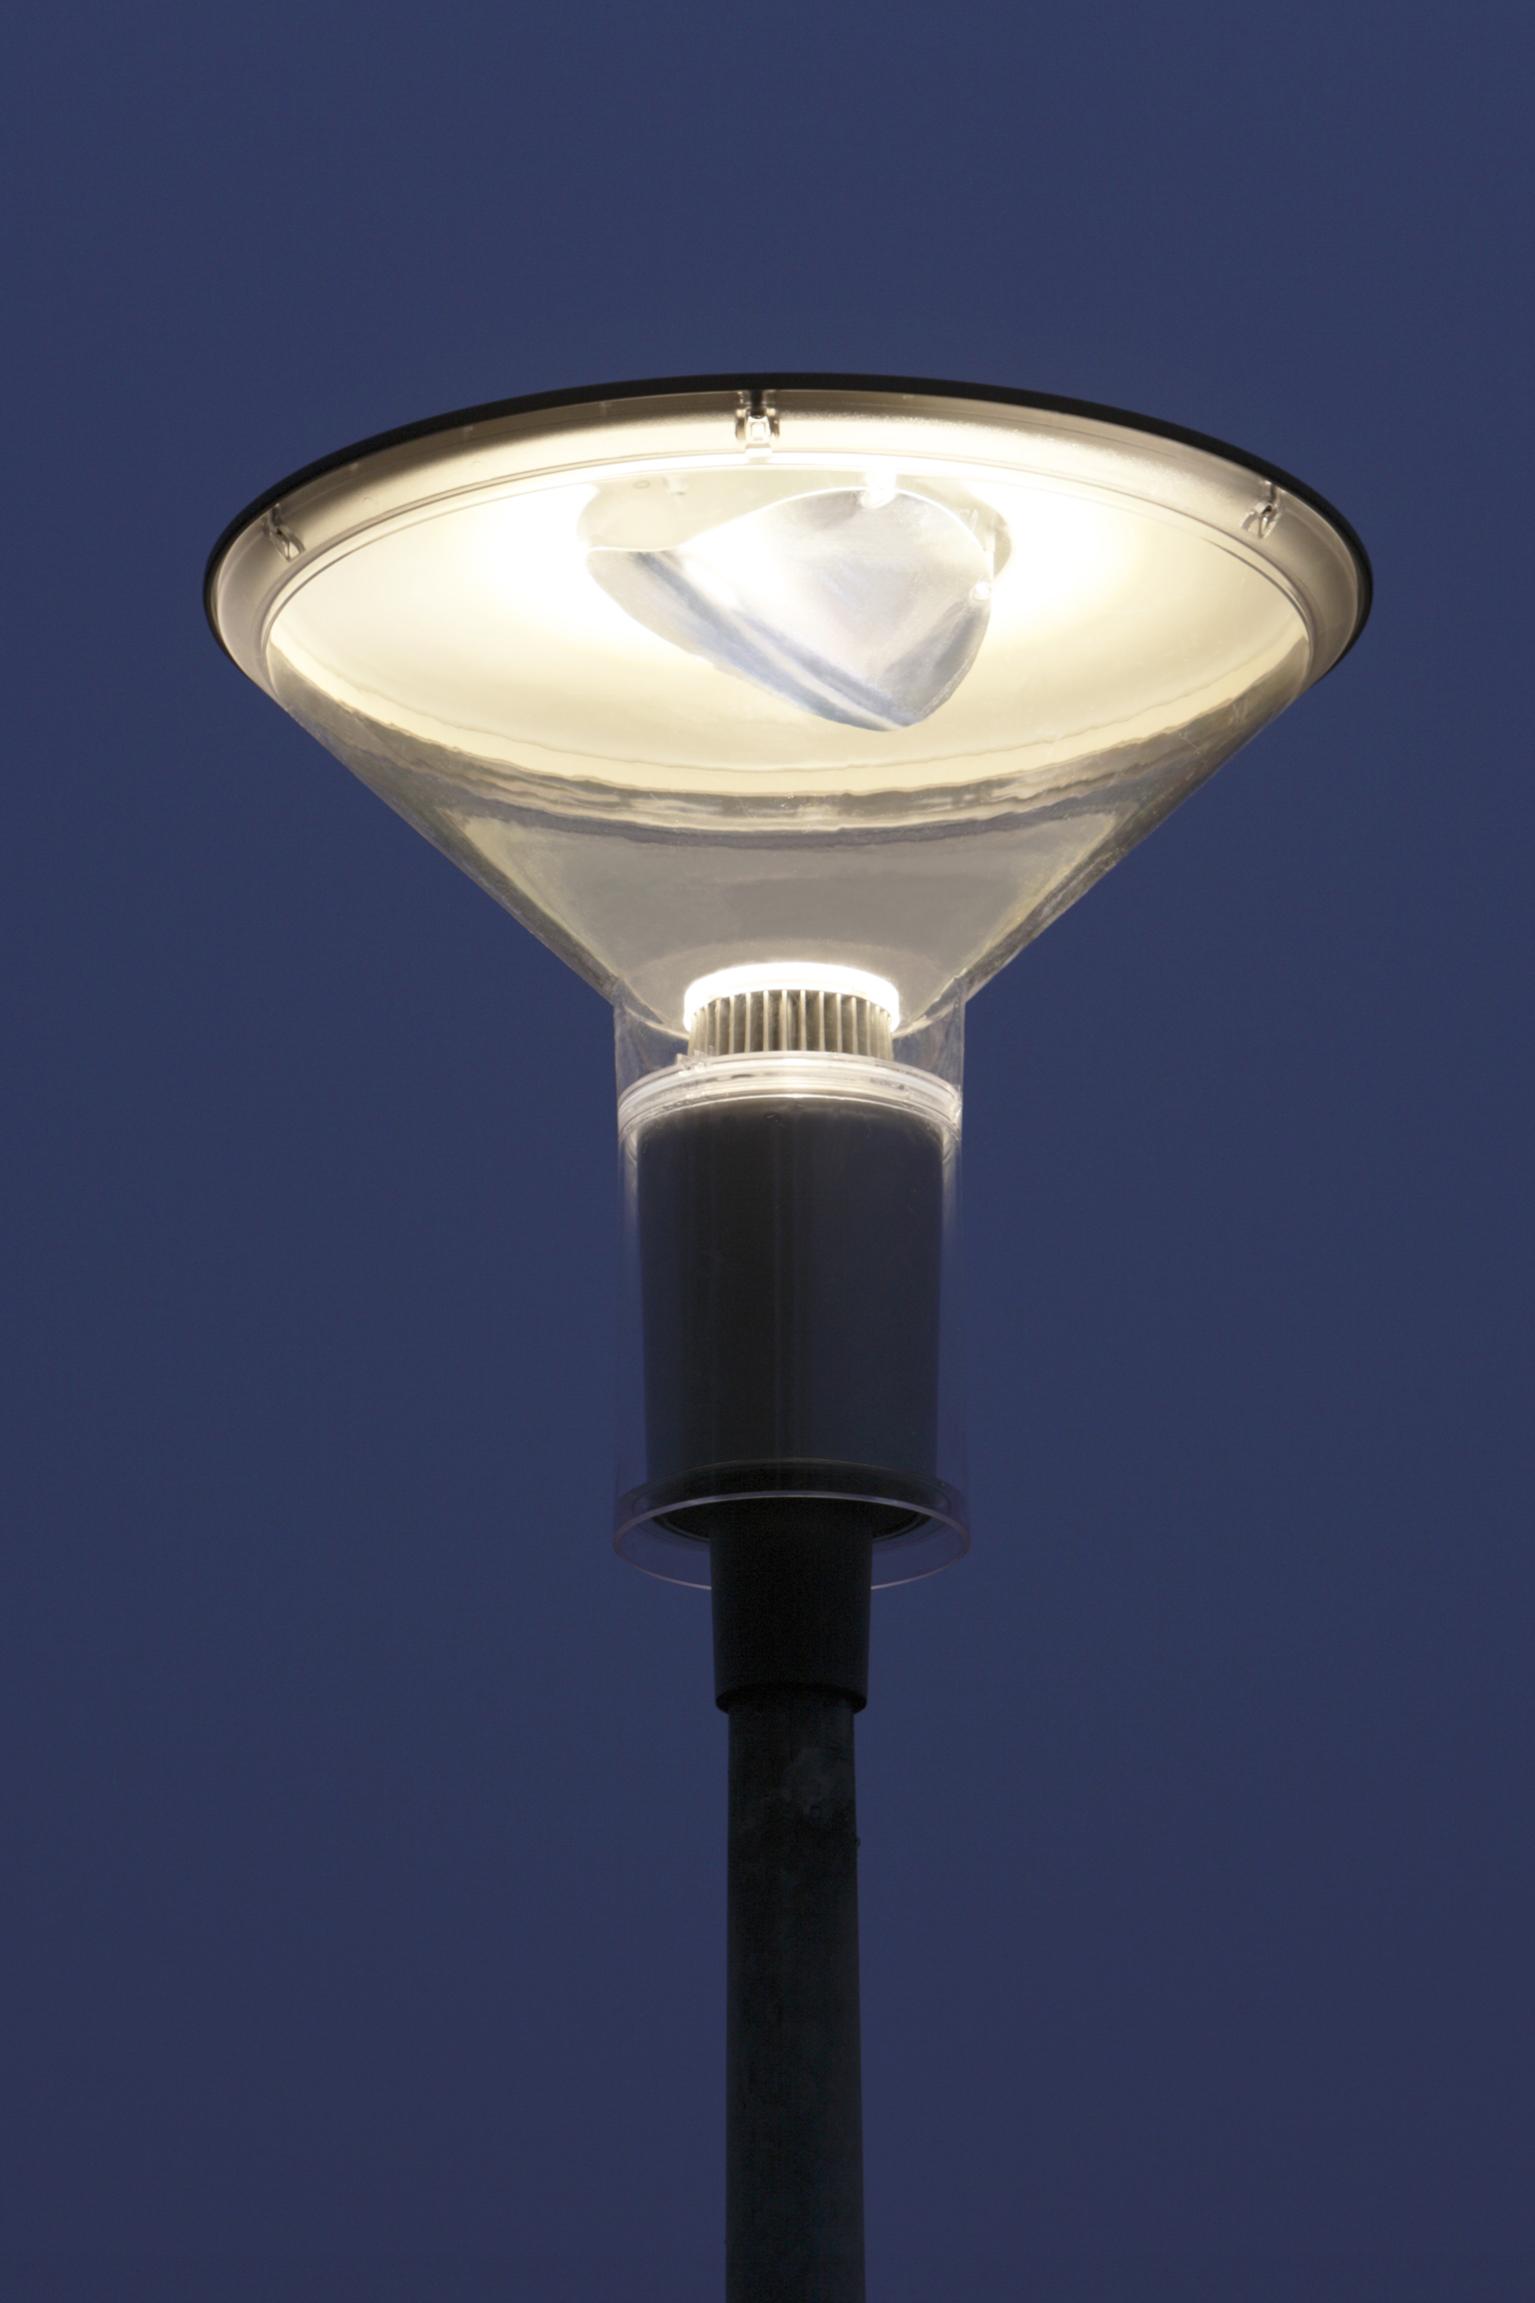 philips led stra enleuchten besseres licht bei ber 70 prozent energieersparnis. Black Bedroom Furniture Sets. Home Design Ideas